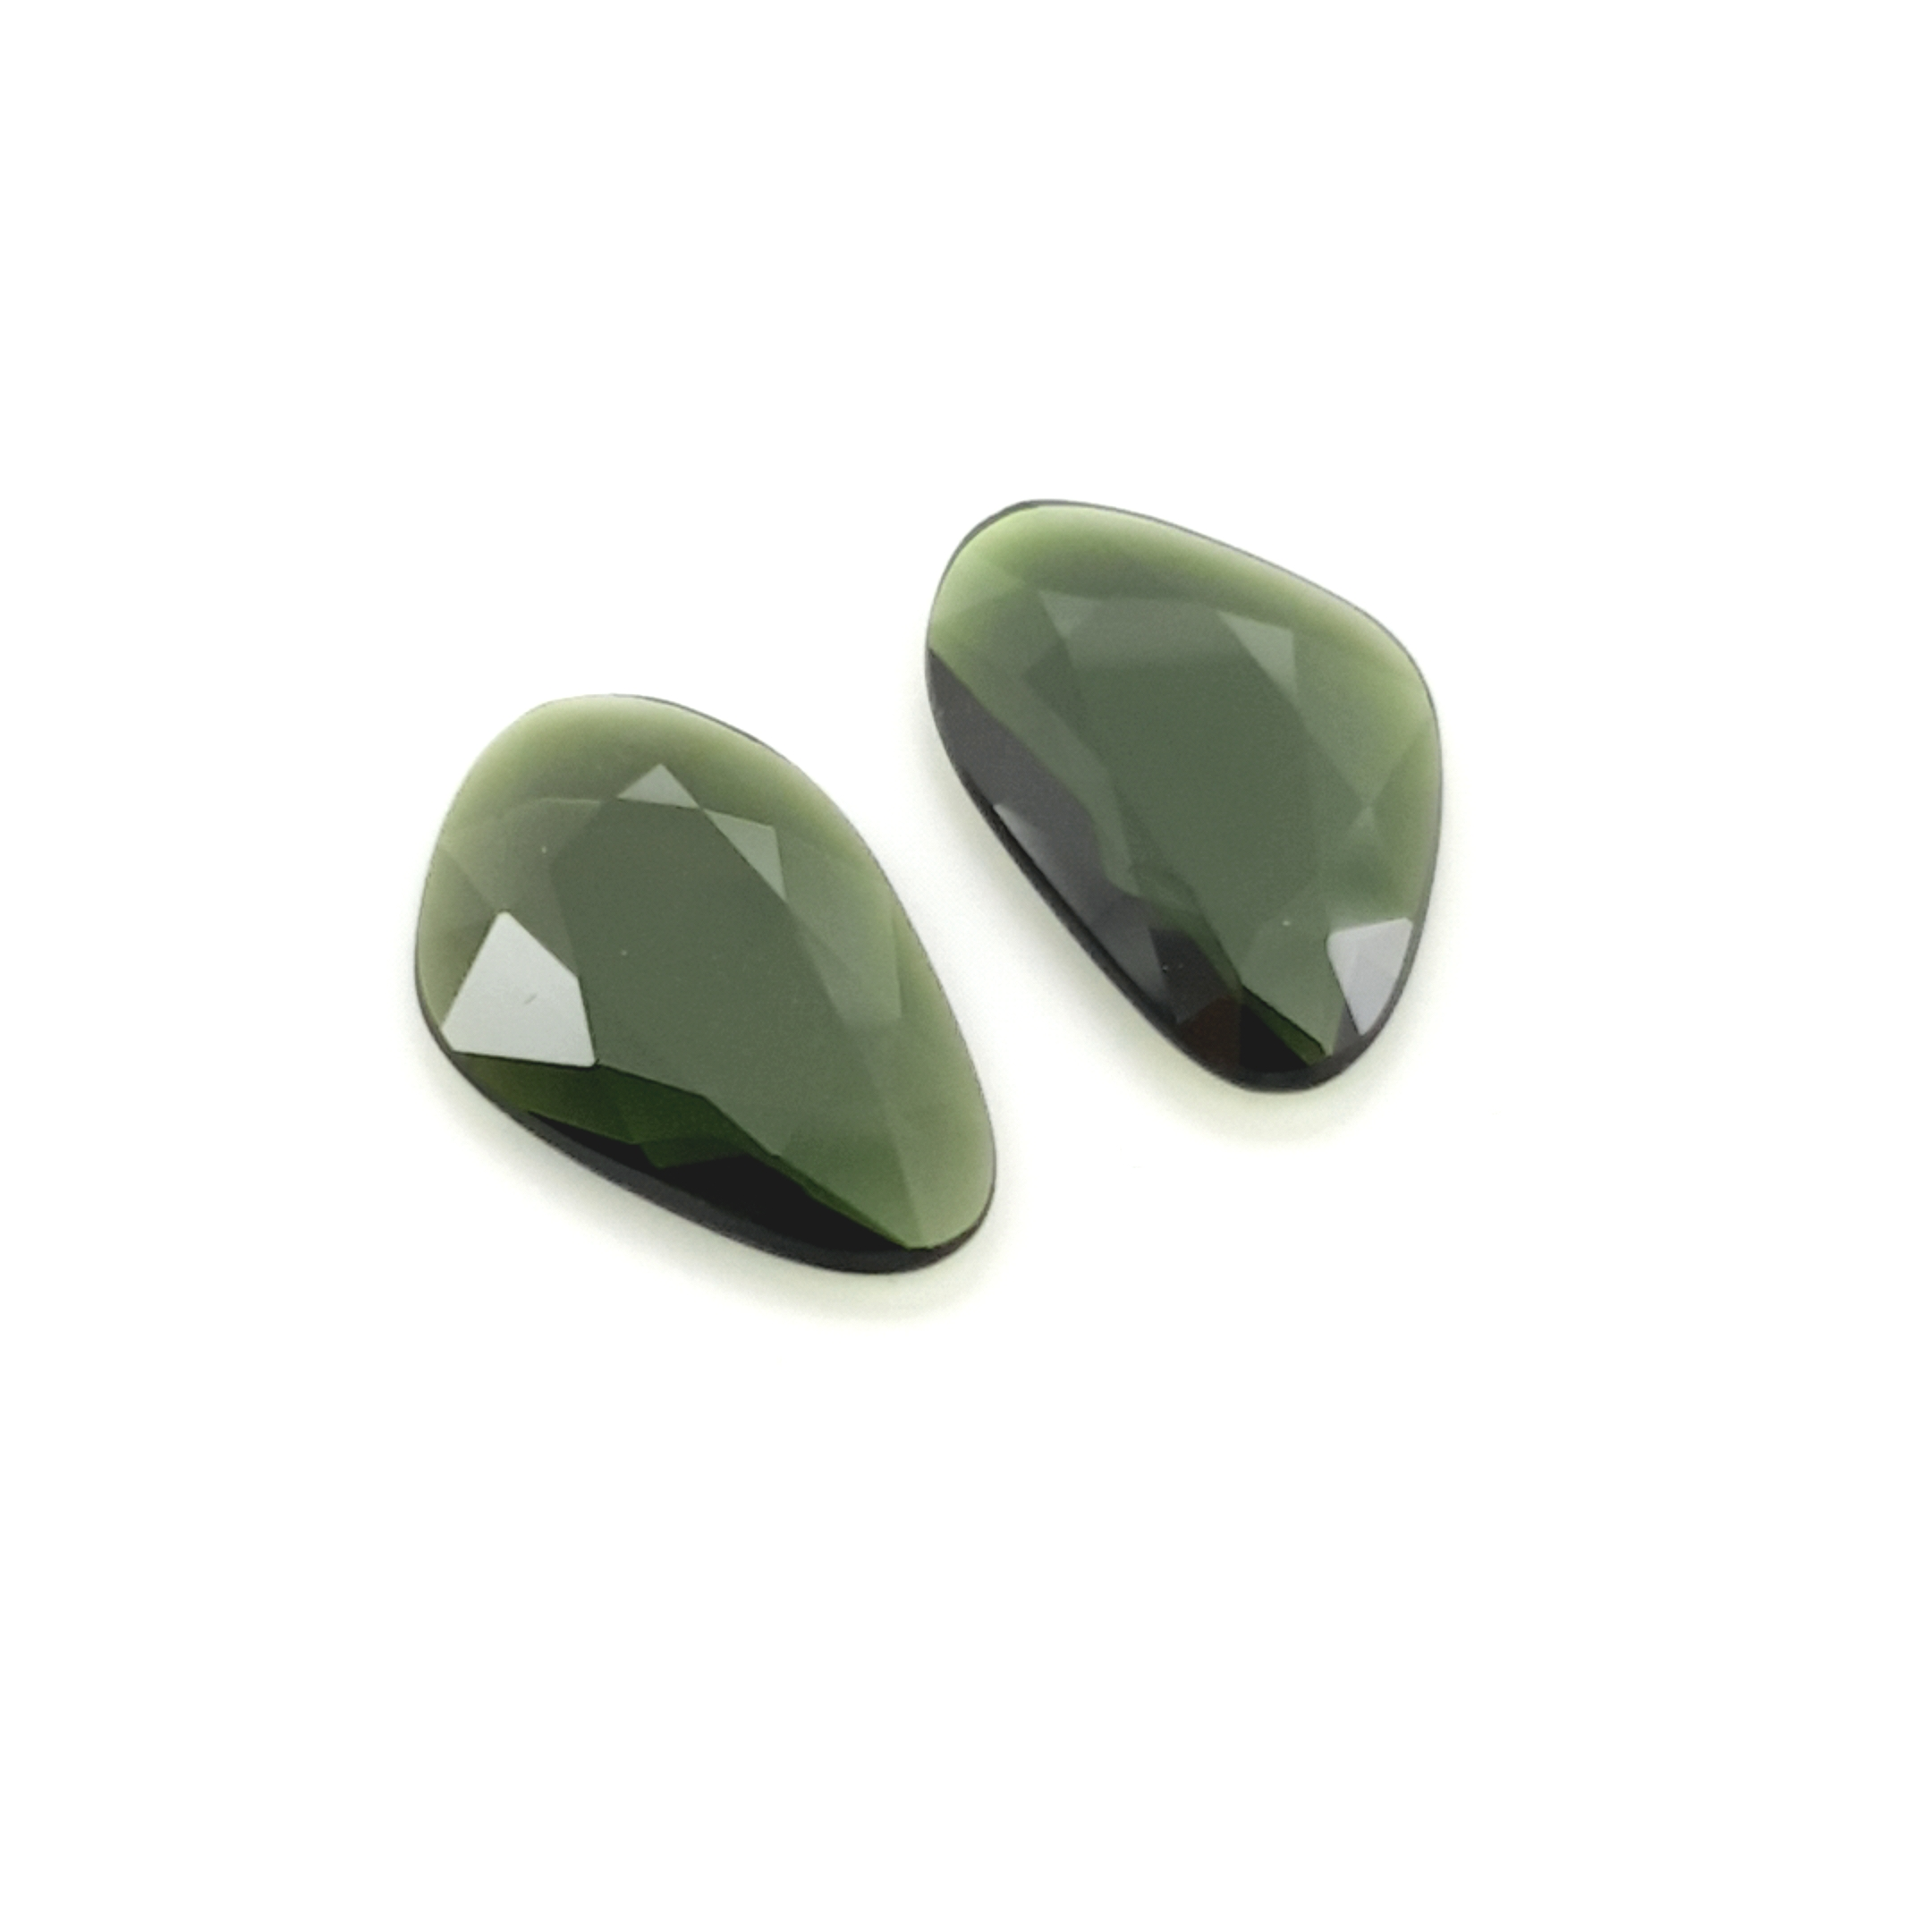 4,90ct.Pair Imperial Green Tourmalin DoubleRoseCut TMJ18C3 ClaudiaHamann__2021-02-11-22-41-03